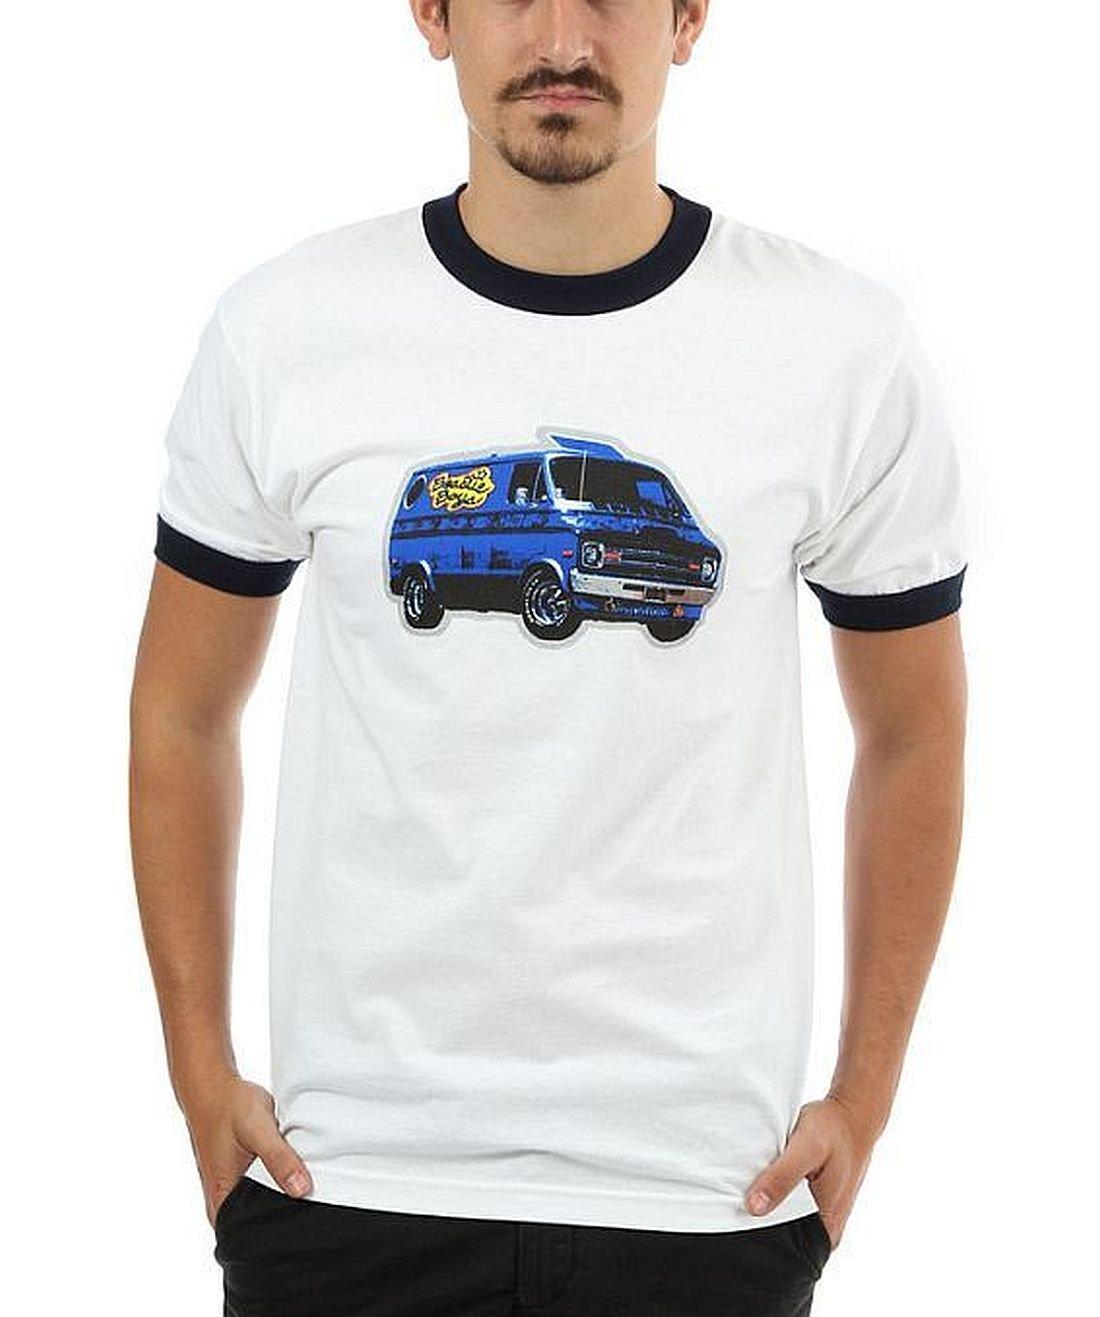 Beastie Boys Van Art Ringer T-Shirt Ill Rock Merch BY244-M